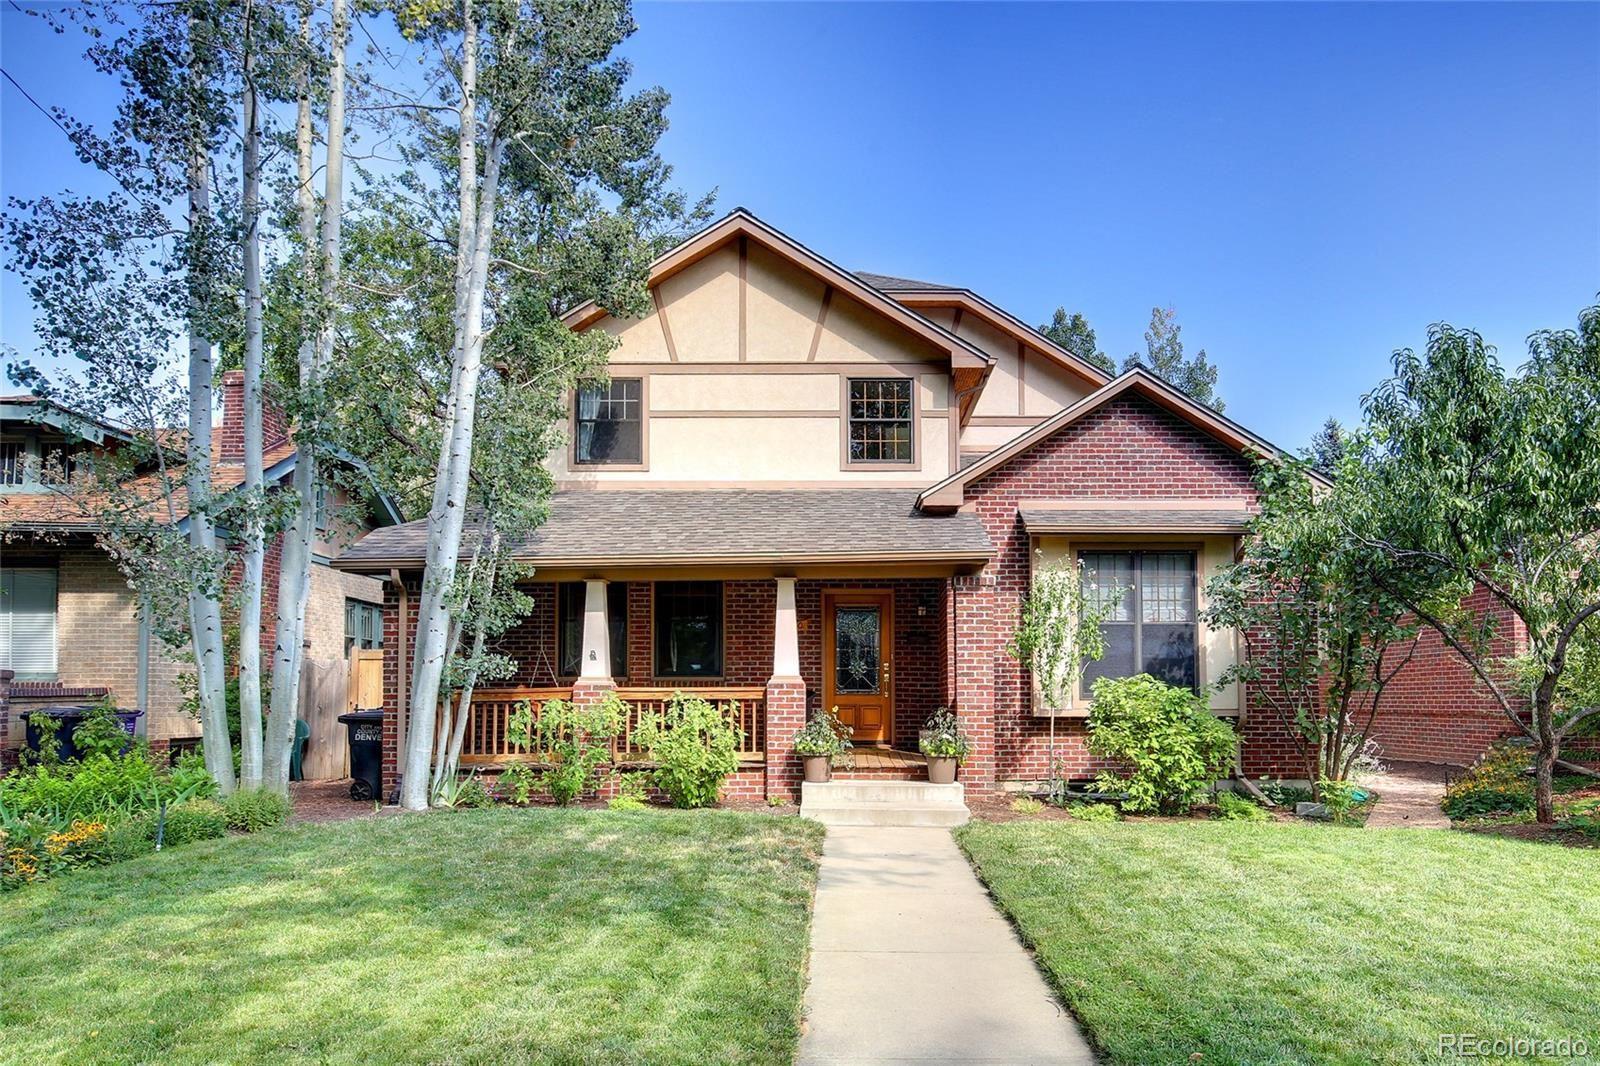 2040 Holly Street, Denver, CO 80207 - #: 6199871